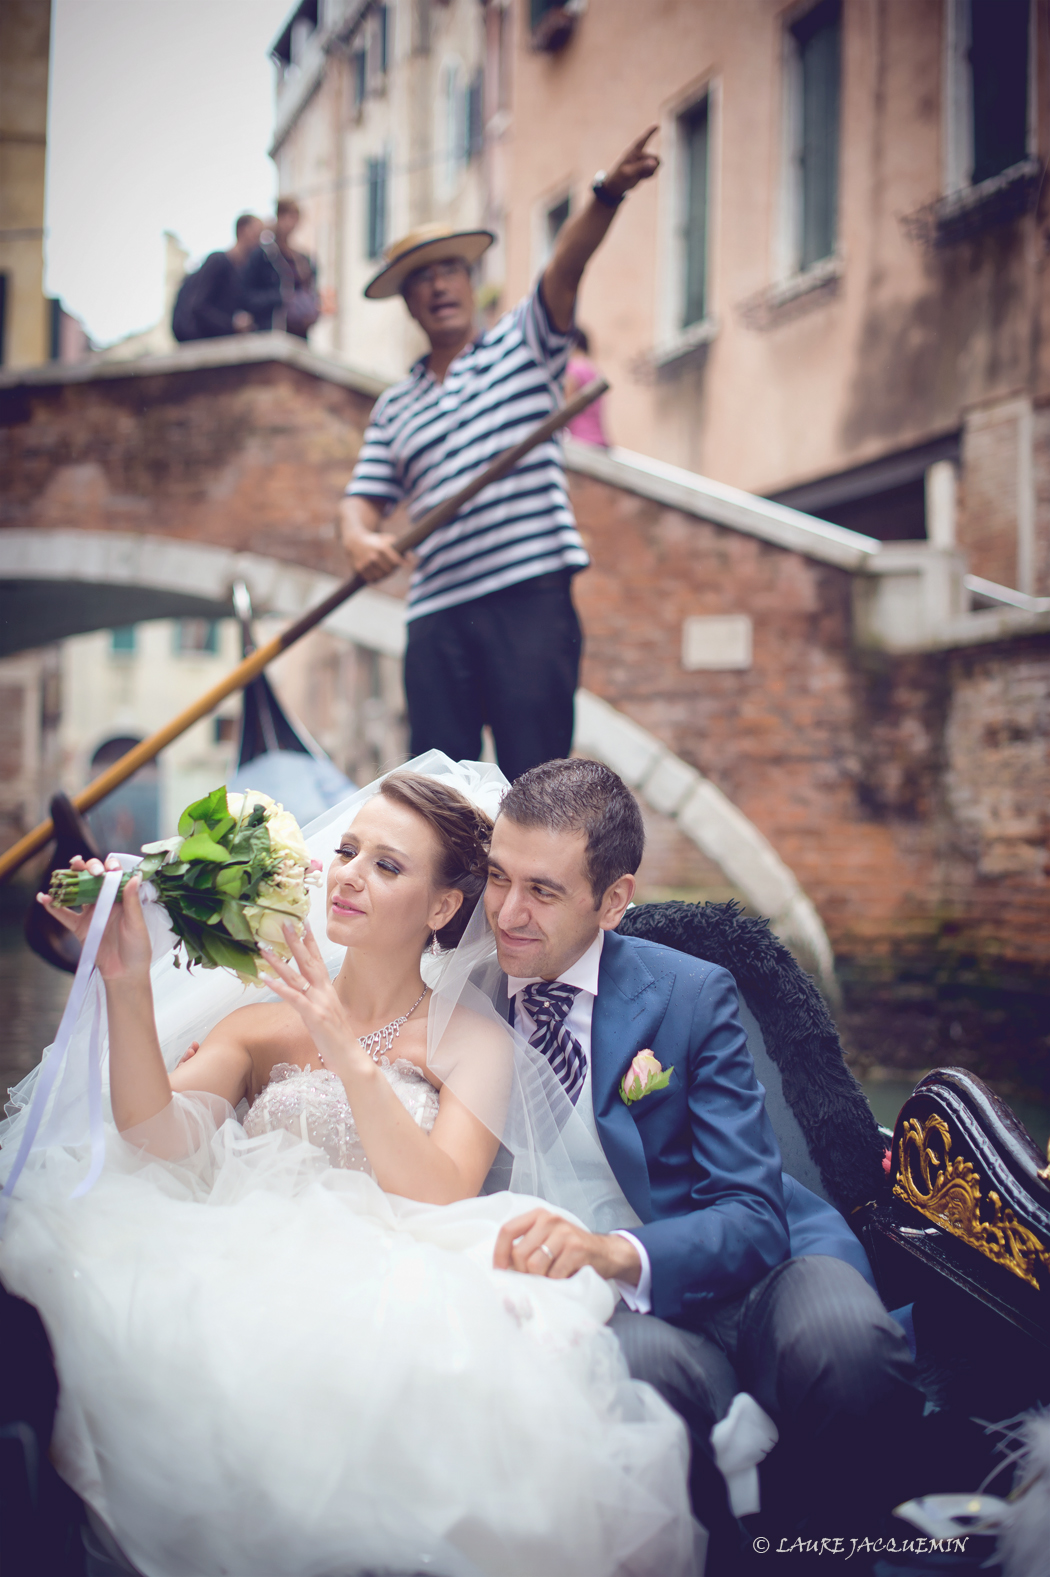 gondola venice photography  wedding laure jacquemin (6).jpg